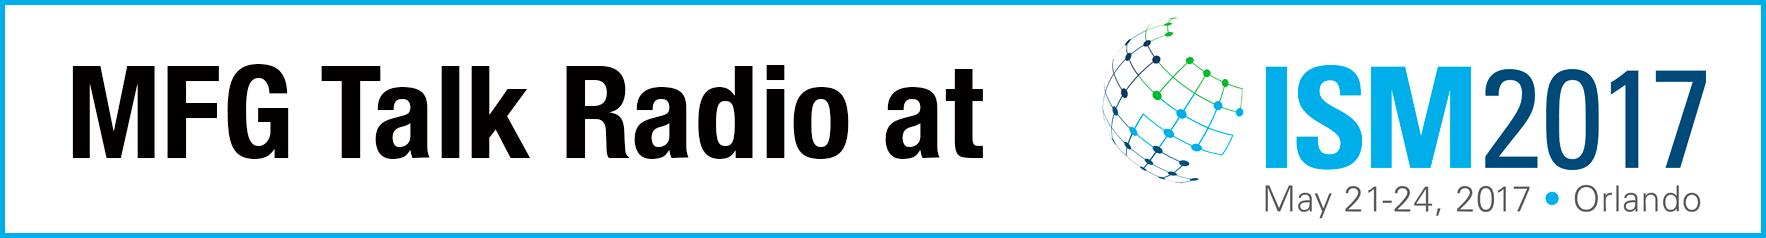 MFG Talk Radio at iSM2017